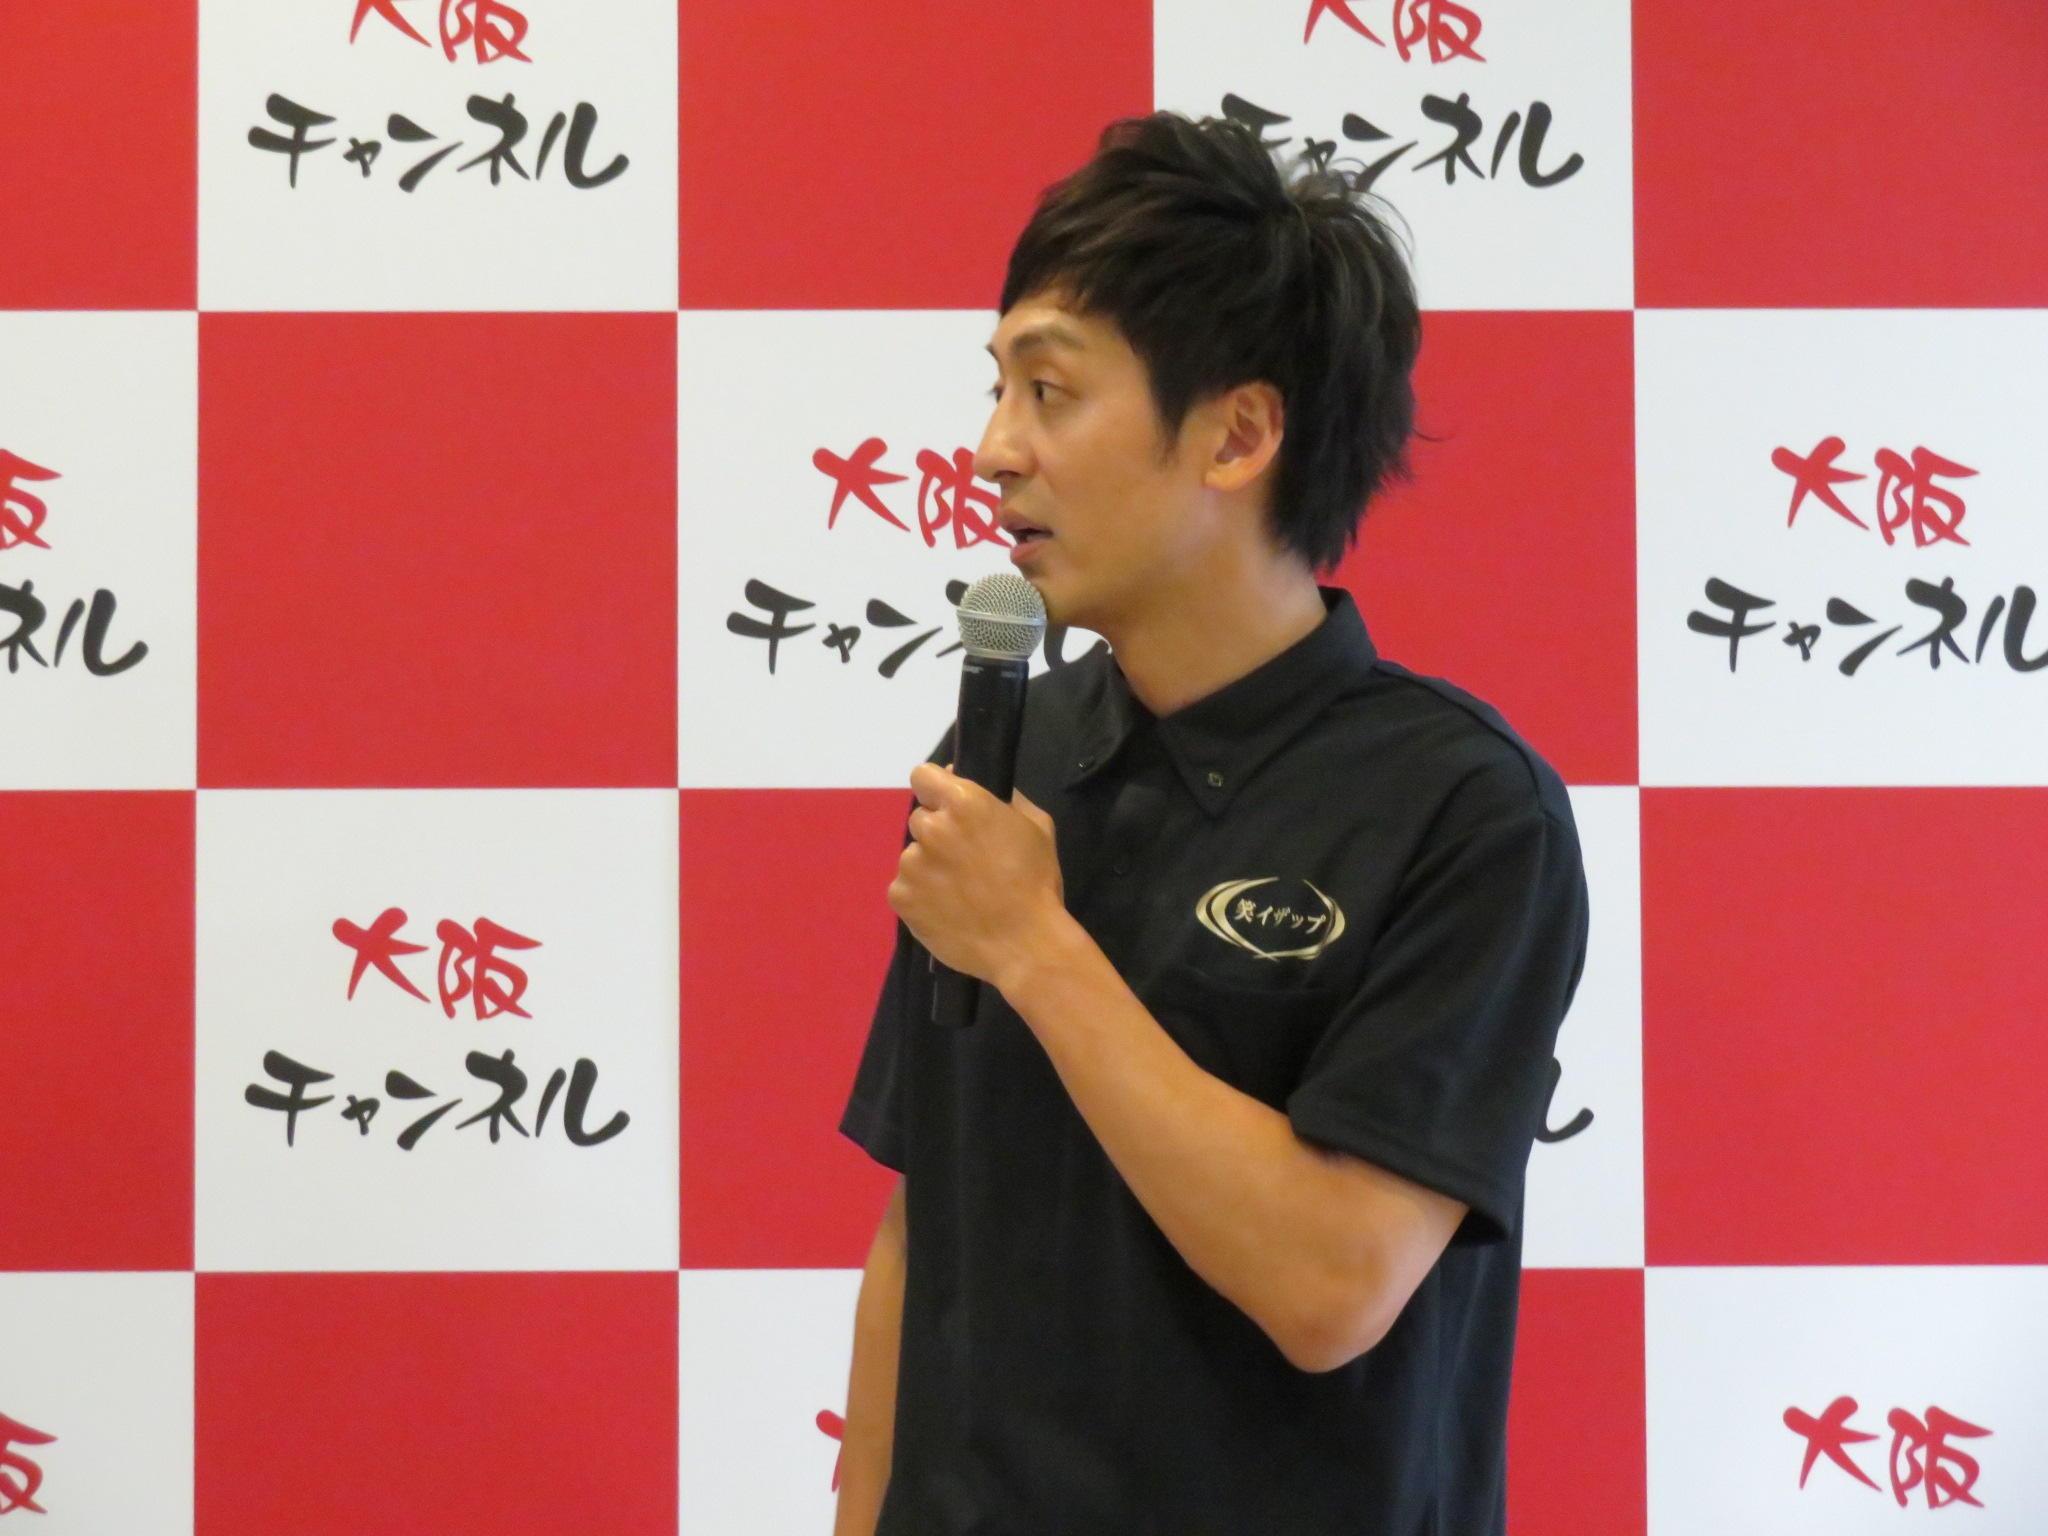 http://news.yoshimoto.co.jp/20180913215703-1baec90f08beebf613f081025684b208ecb449c8.jpg